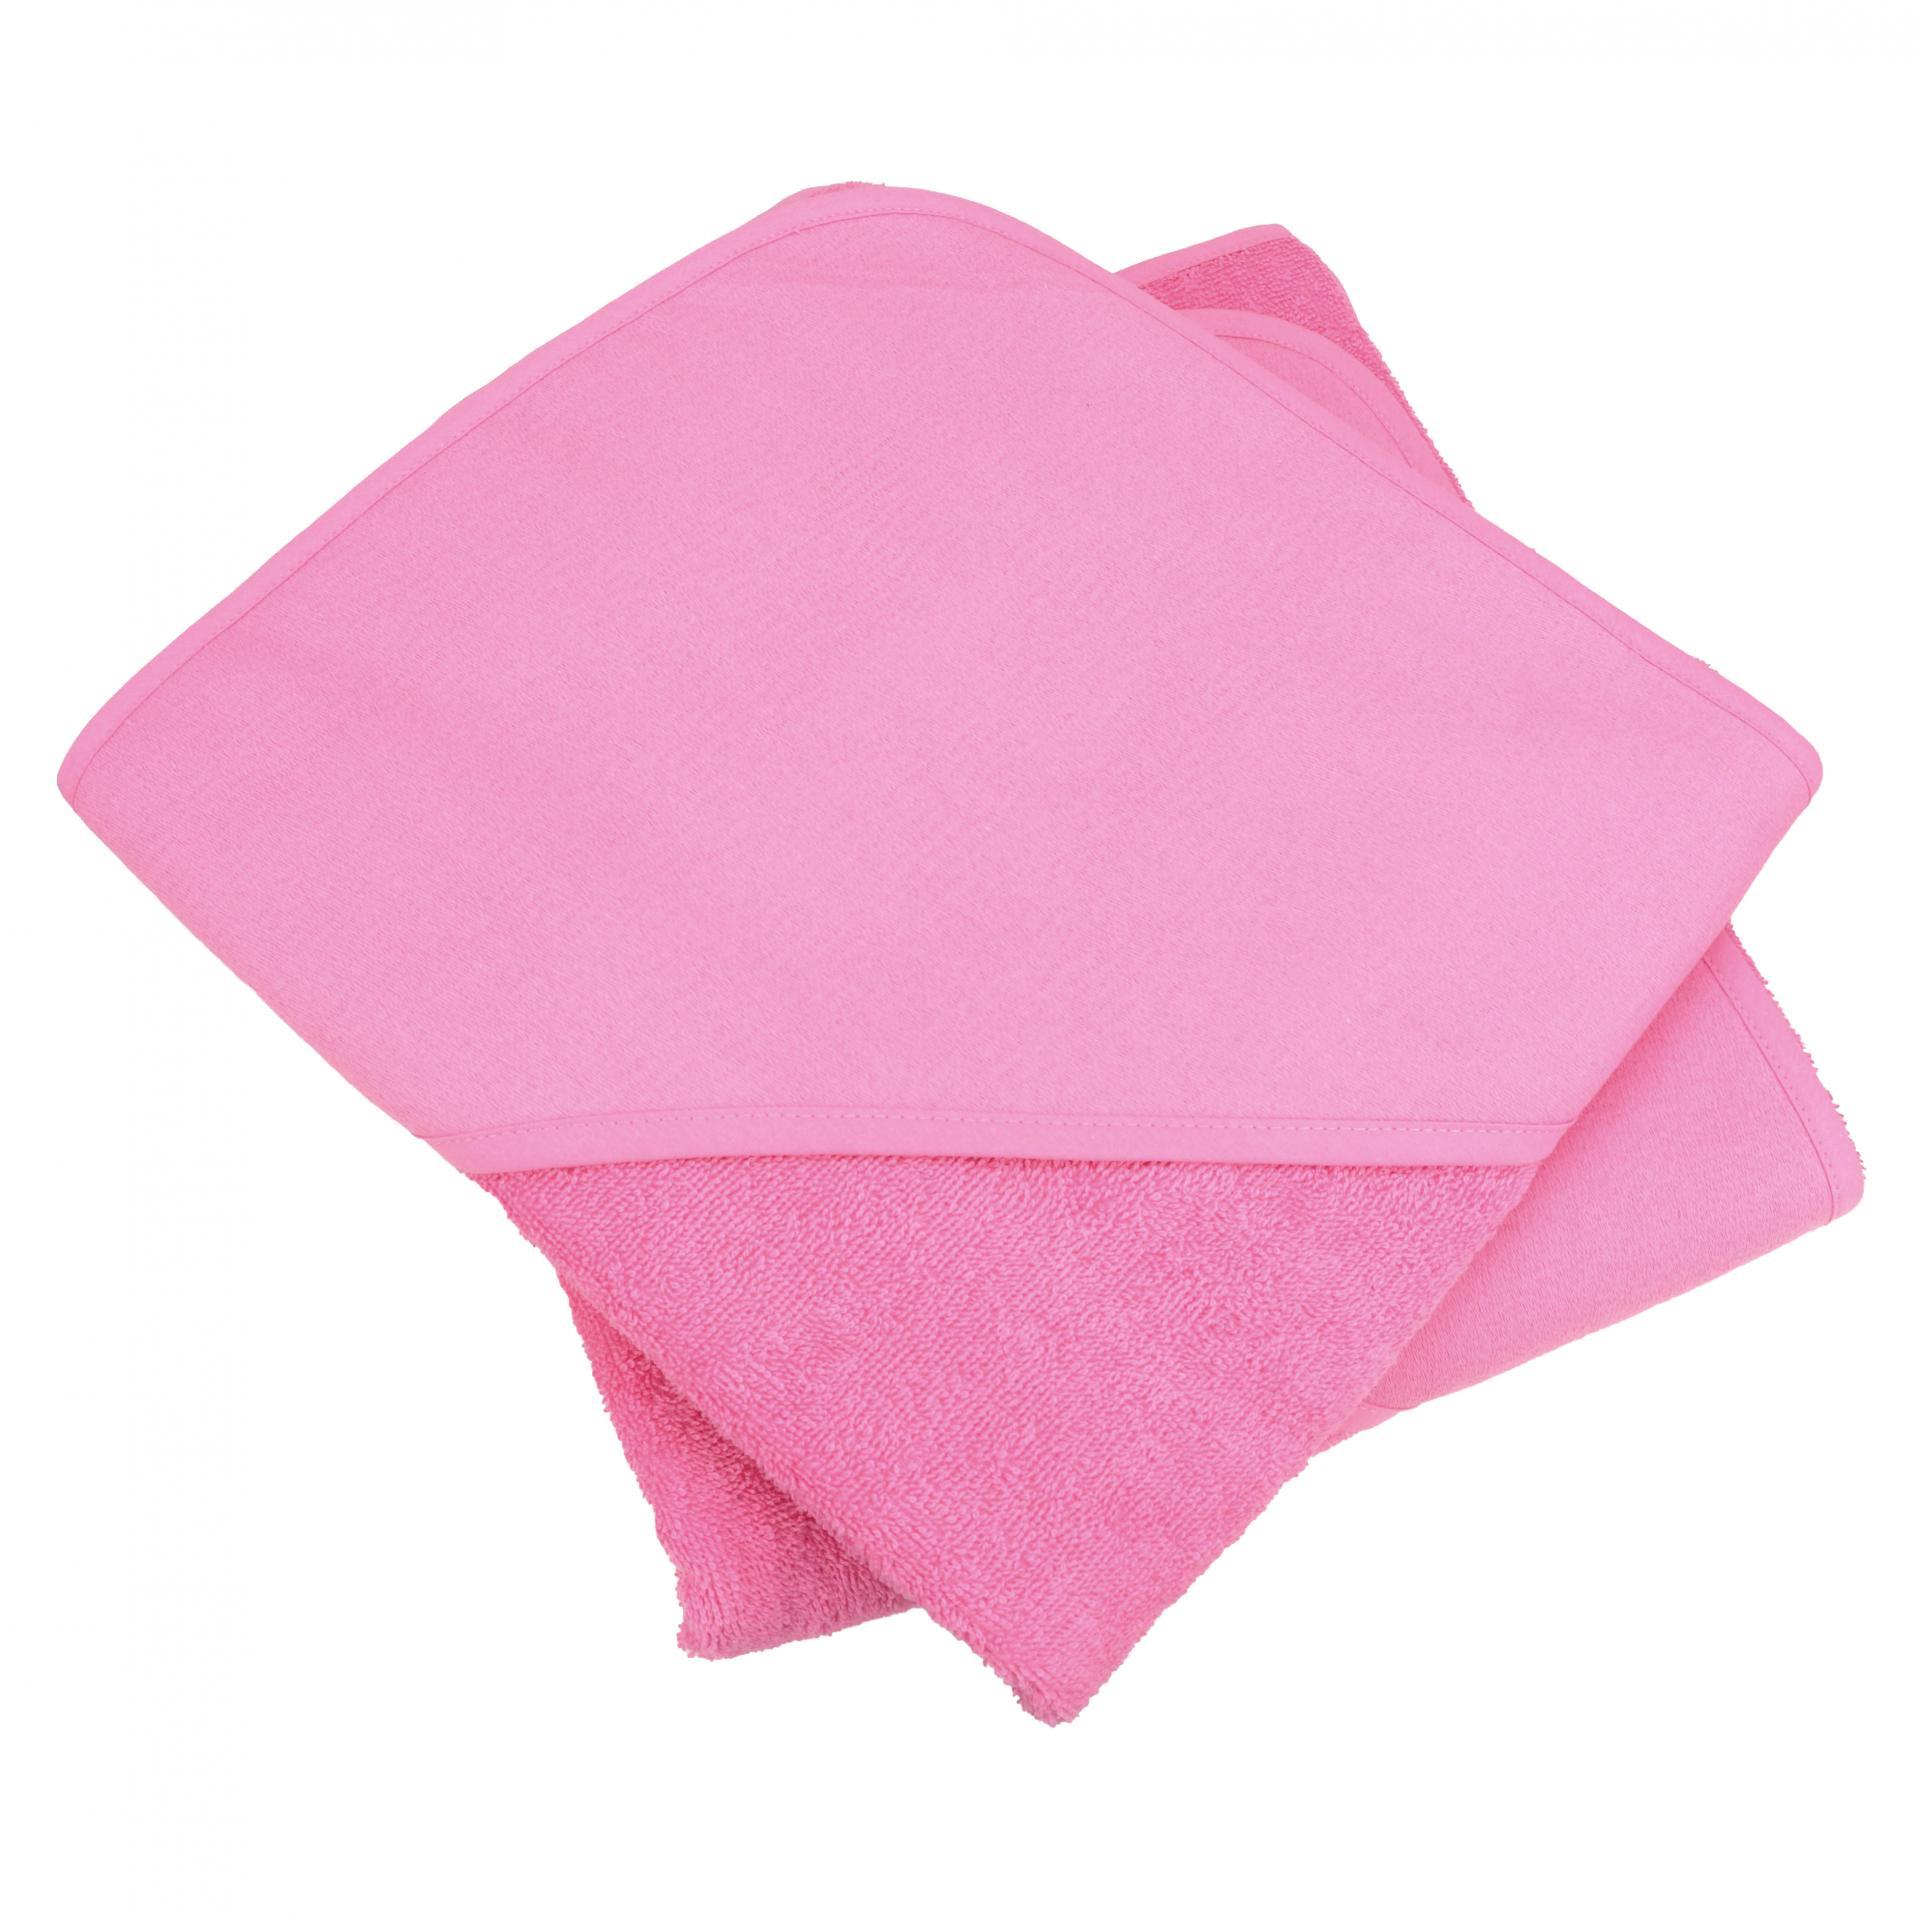 Ar732 pink pink ft